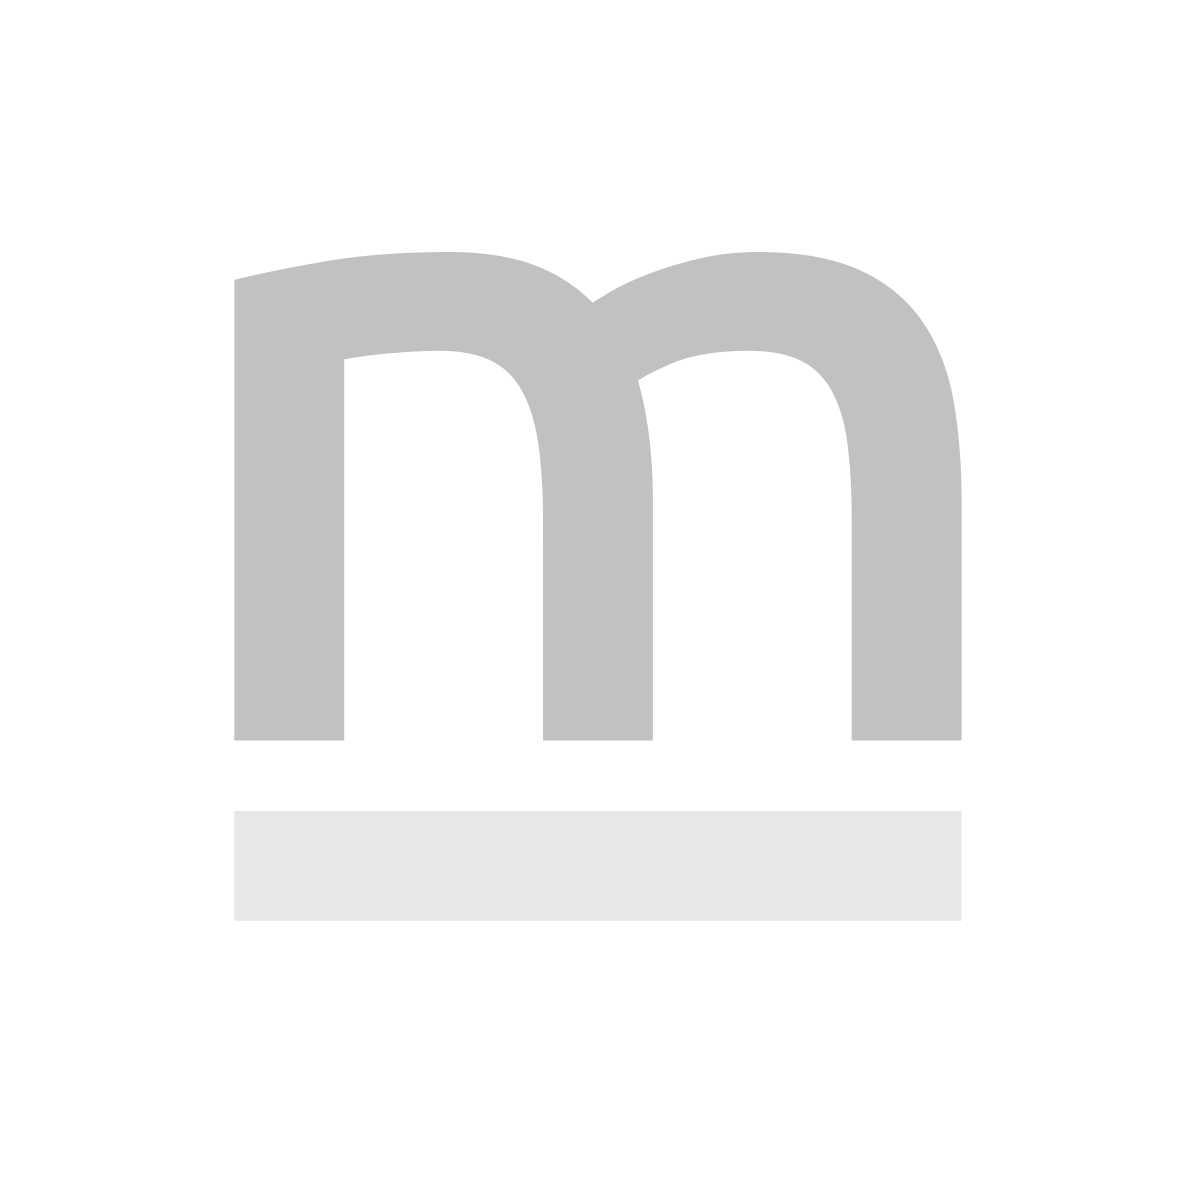 Dywan SOUNDS OF SUMMER MEDIUM 140x200 beżowy/brązowy/różowy